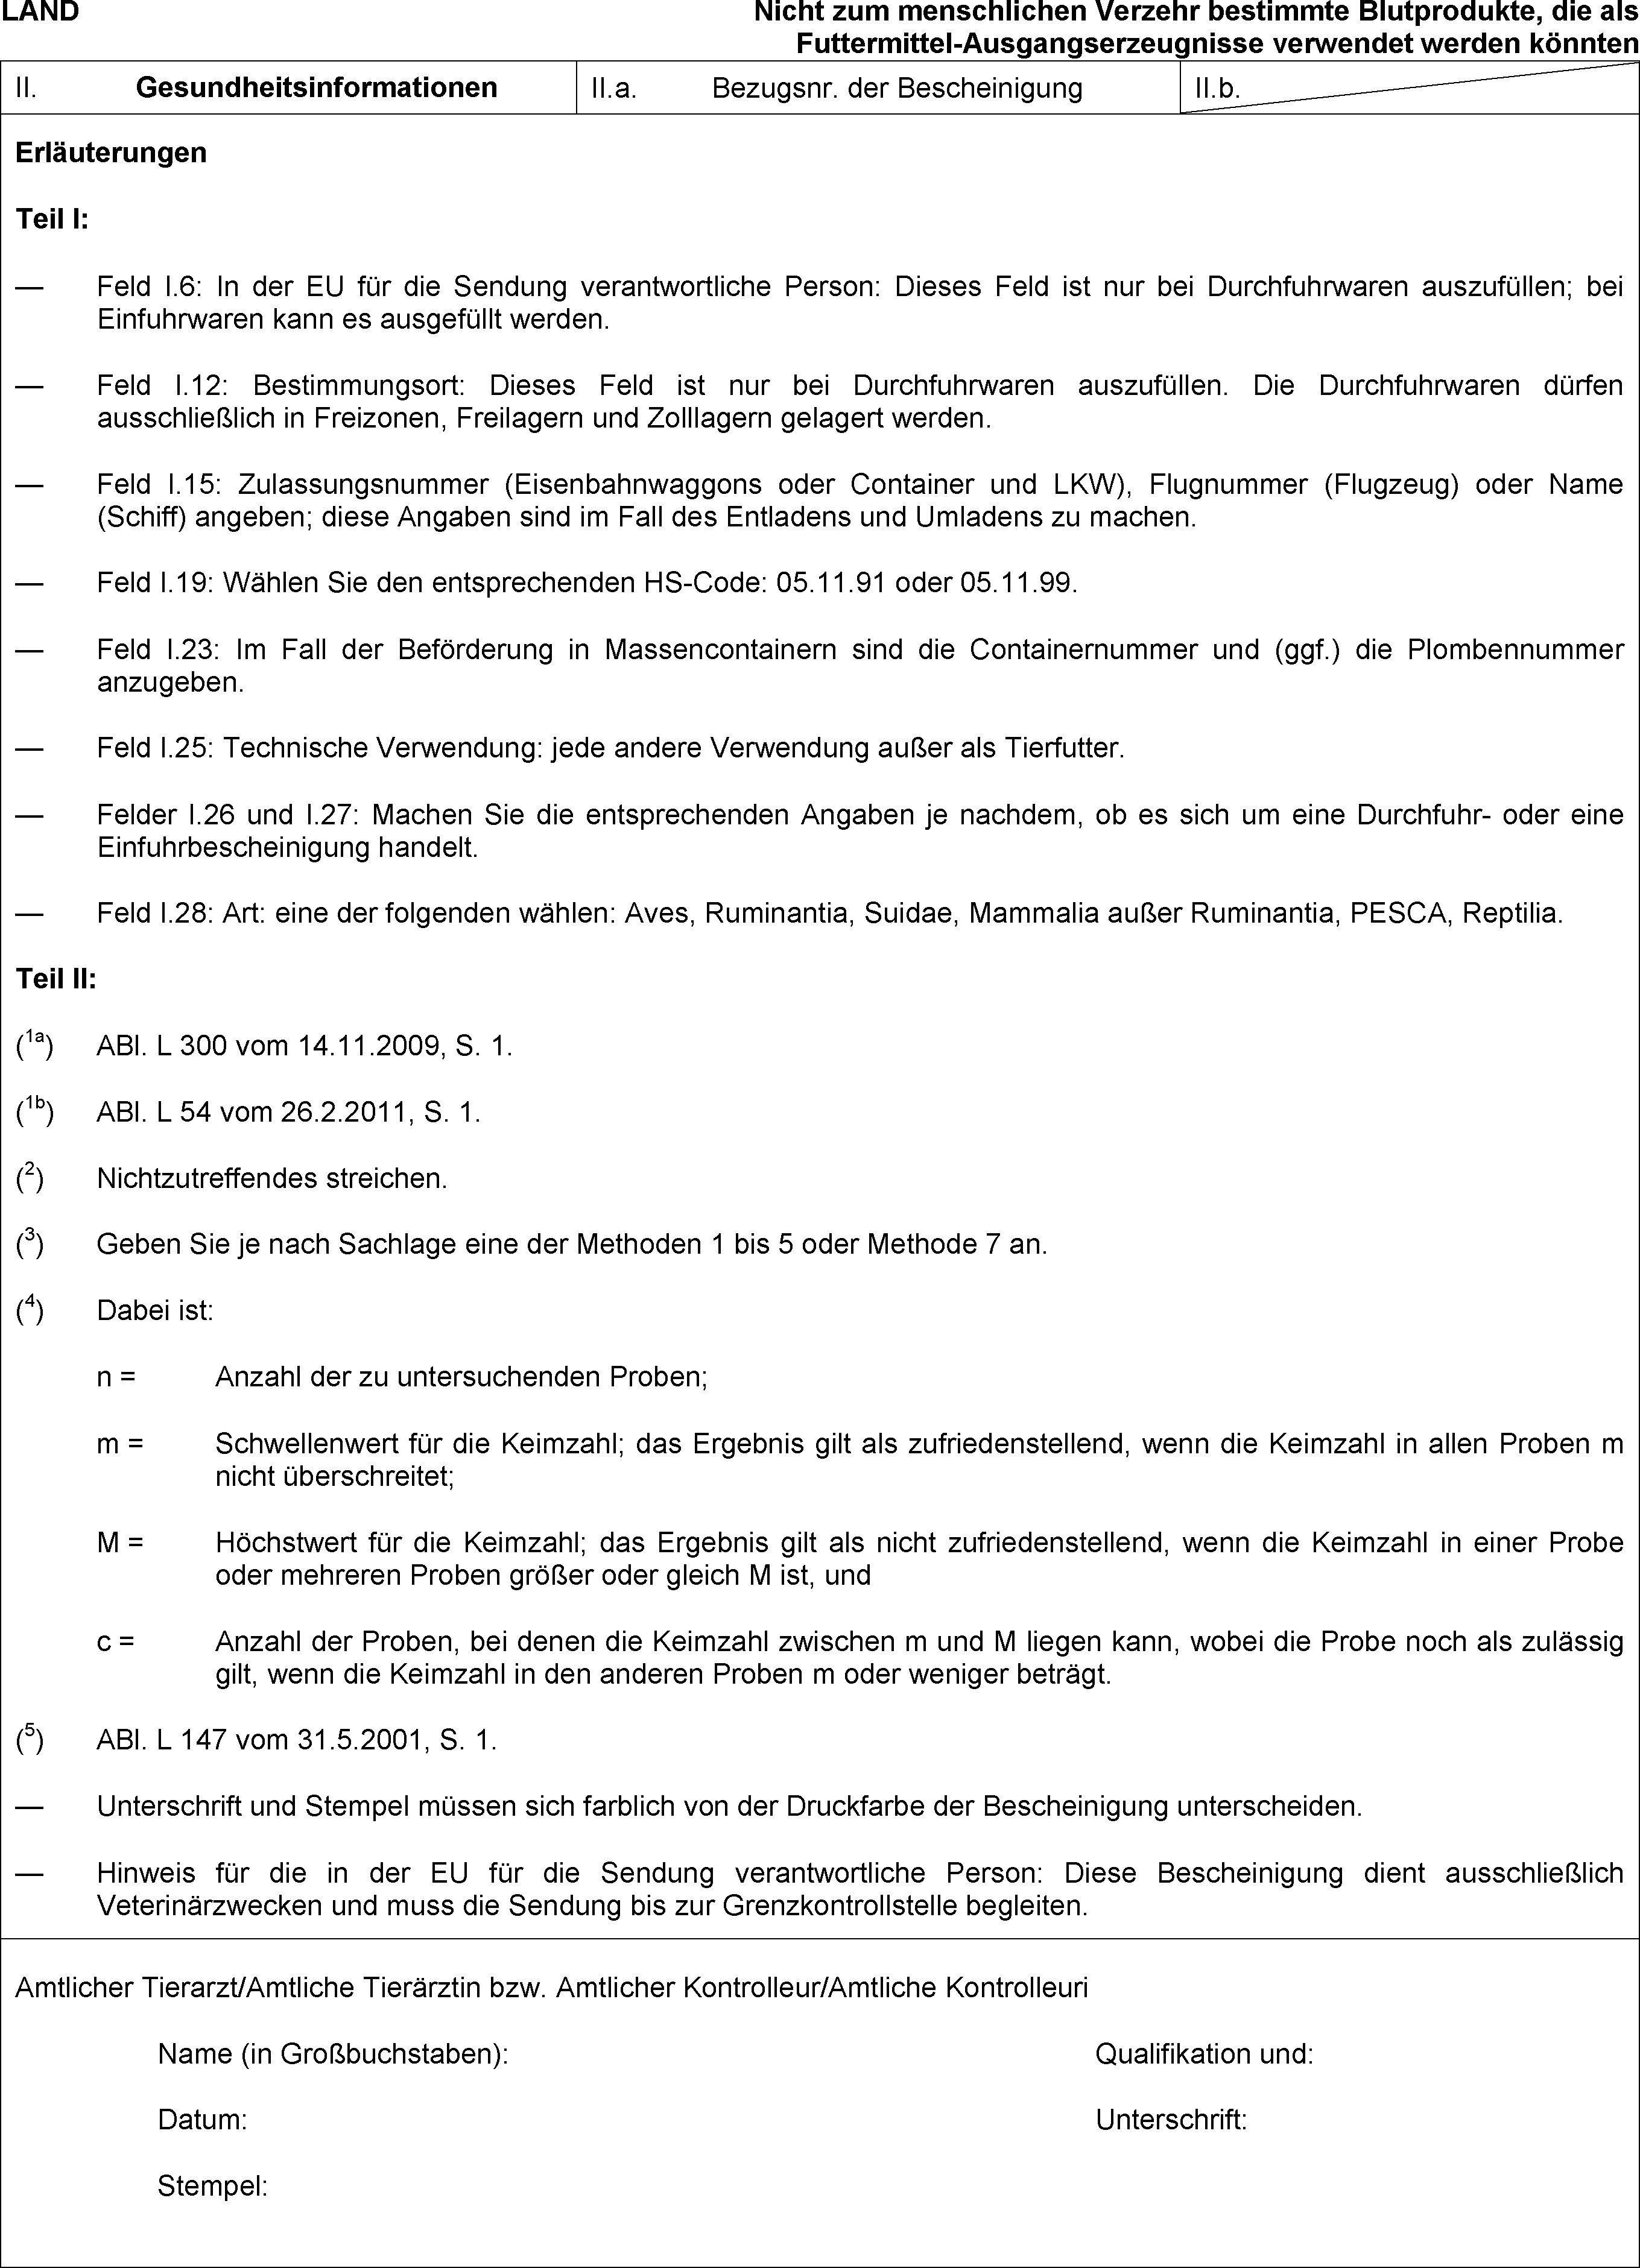 EUR-Lex - 02011R0142-20170222 - EN - EUR-Lex